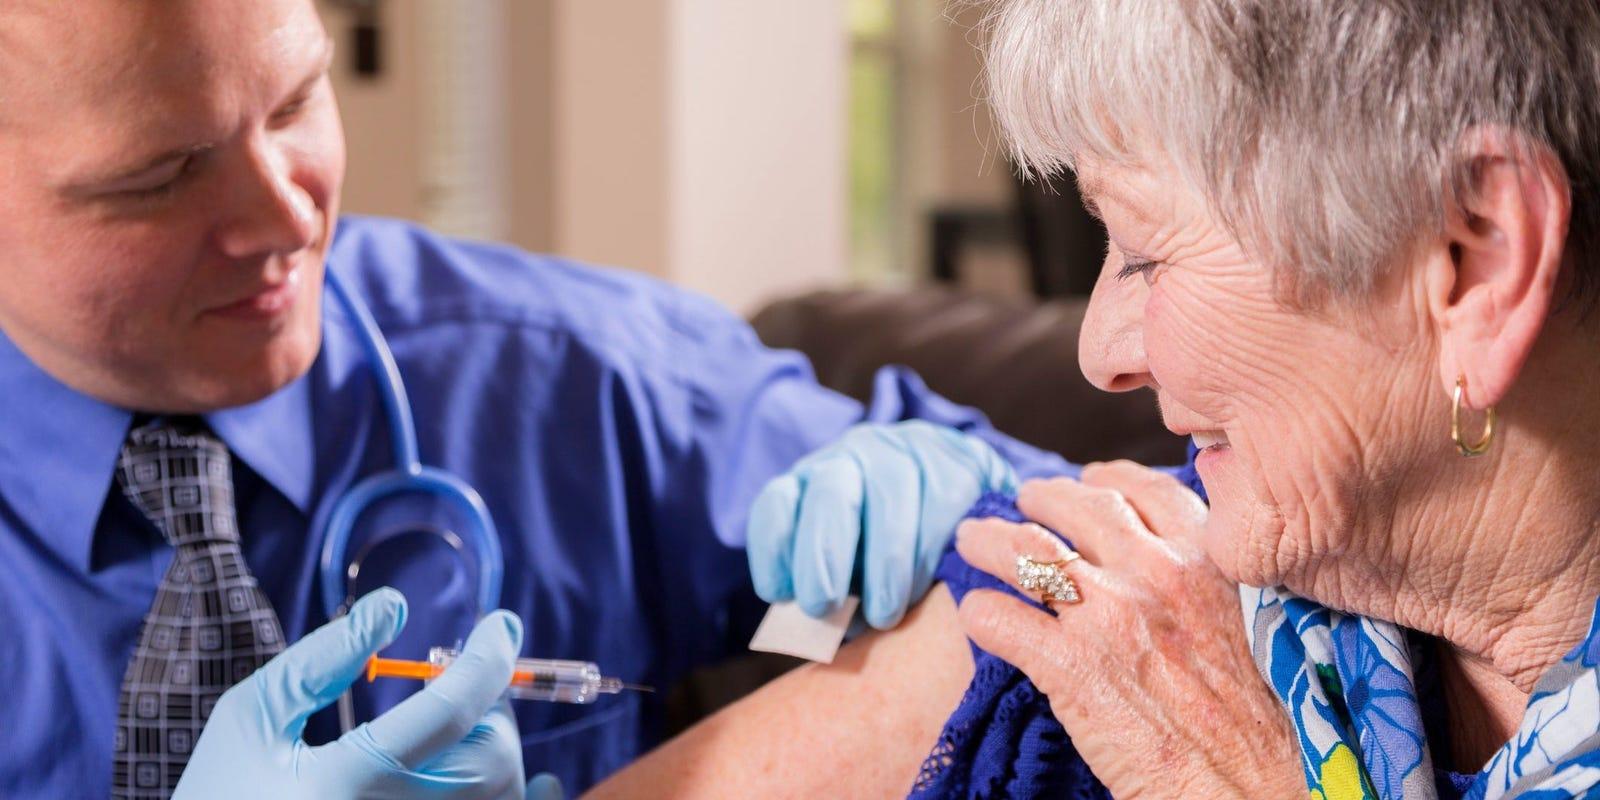 CVS, Walgreens flu shots begin: Pharmacists take COVID-19 precautions